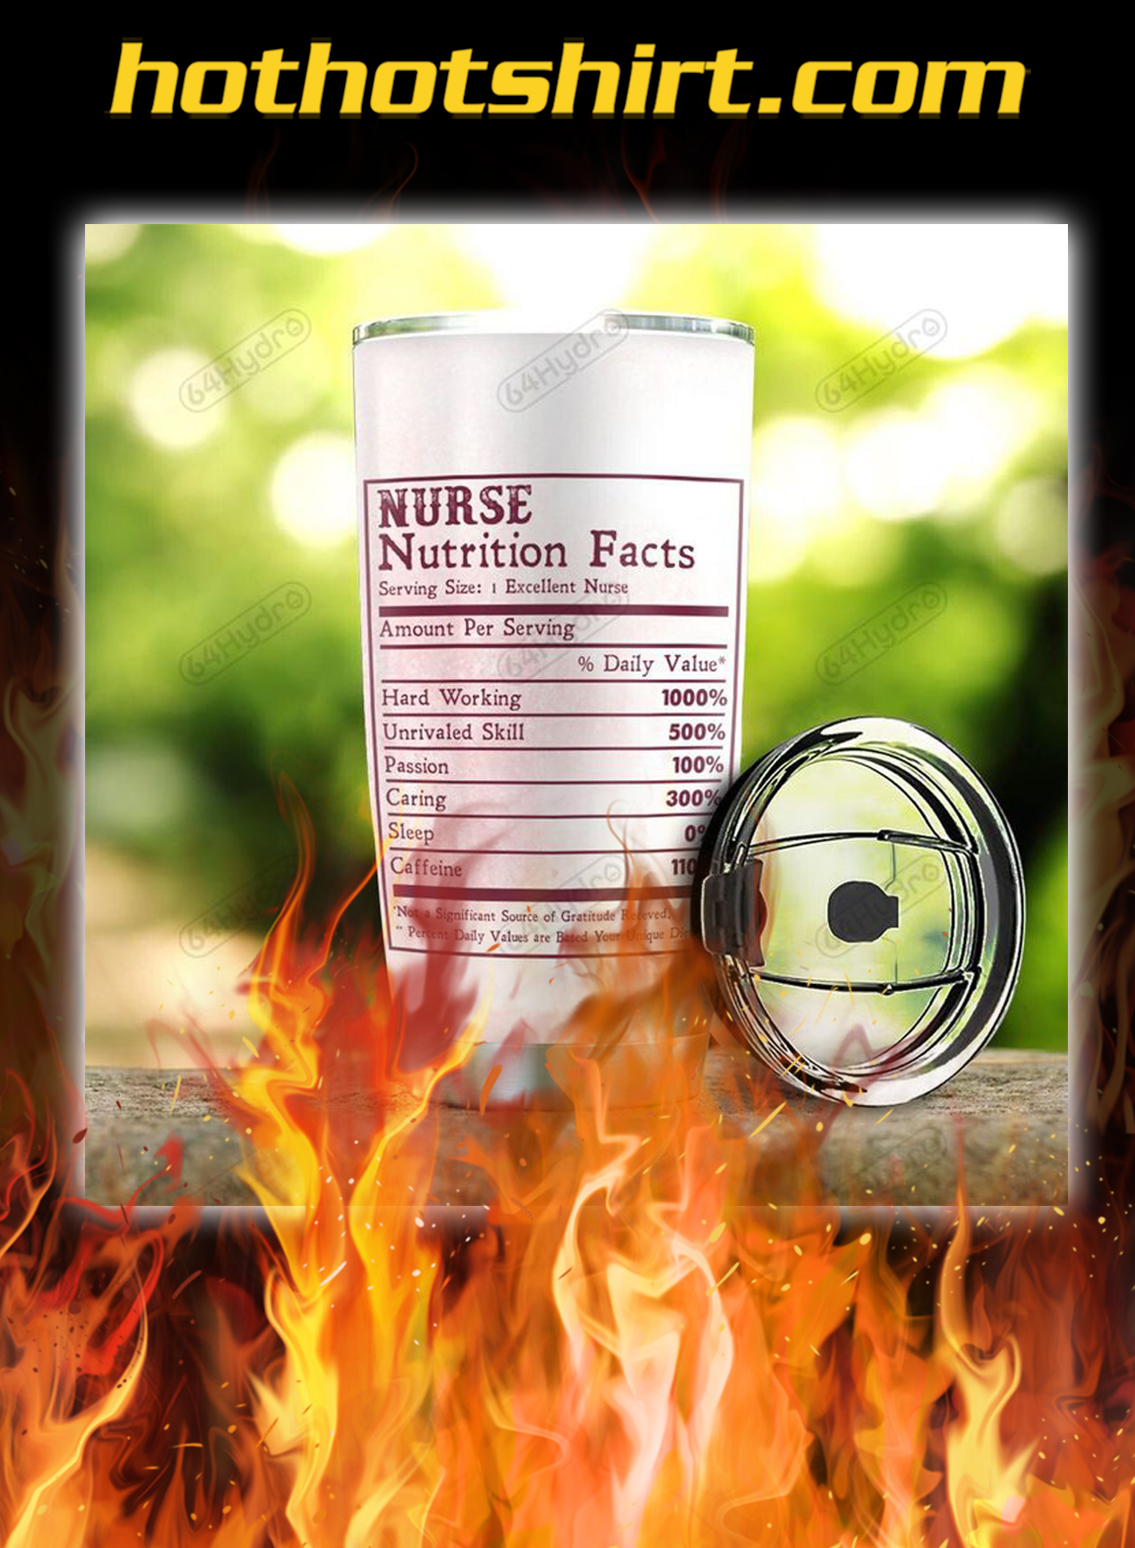 Personalized Brave Nurse Nutrition Facts Tumbler- pic 2